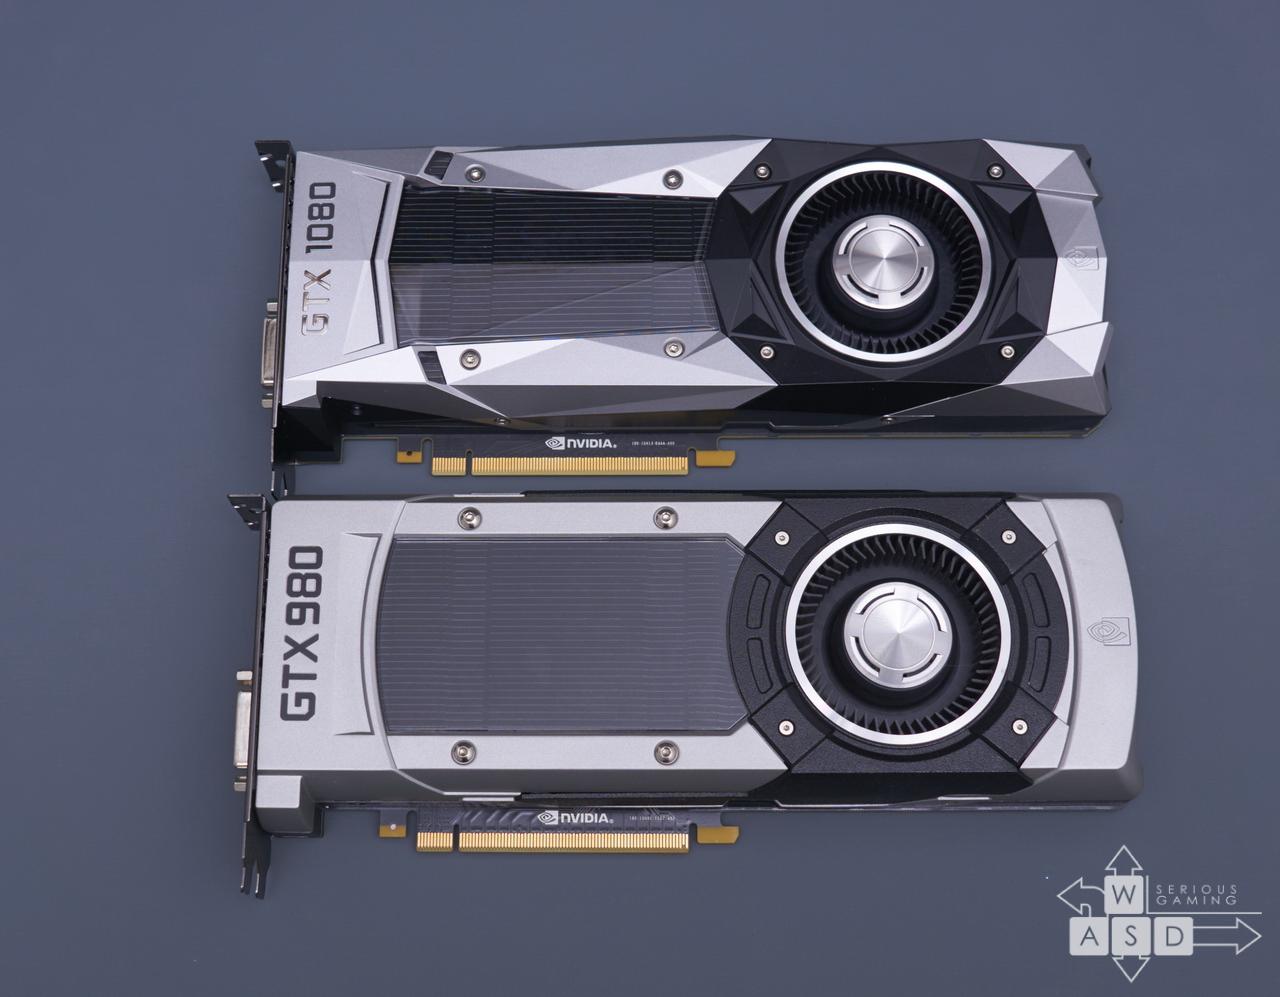 Nvidia GeForce GTX 980 & GTX 1080